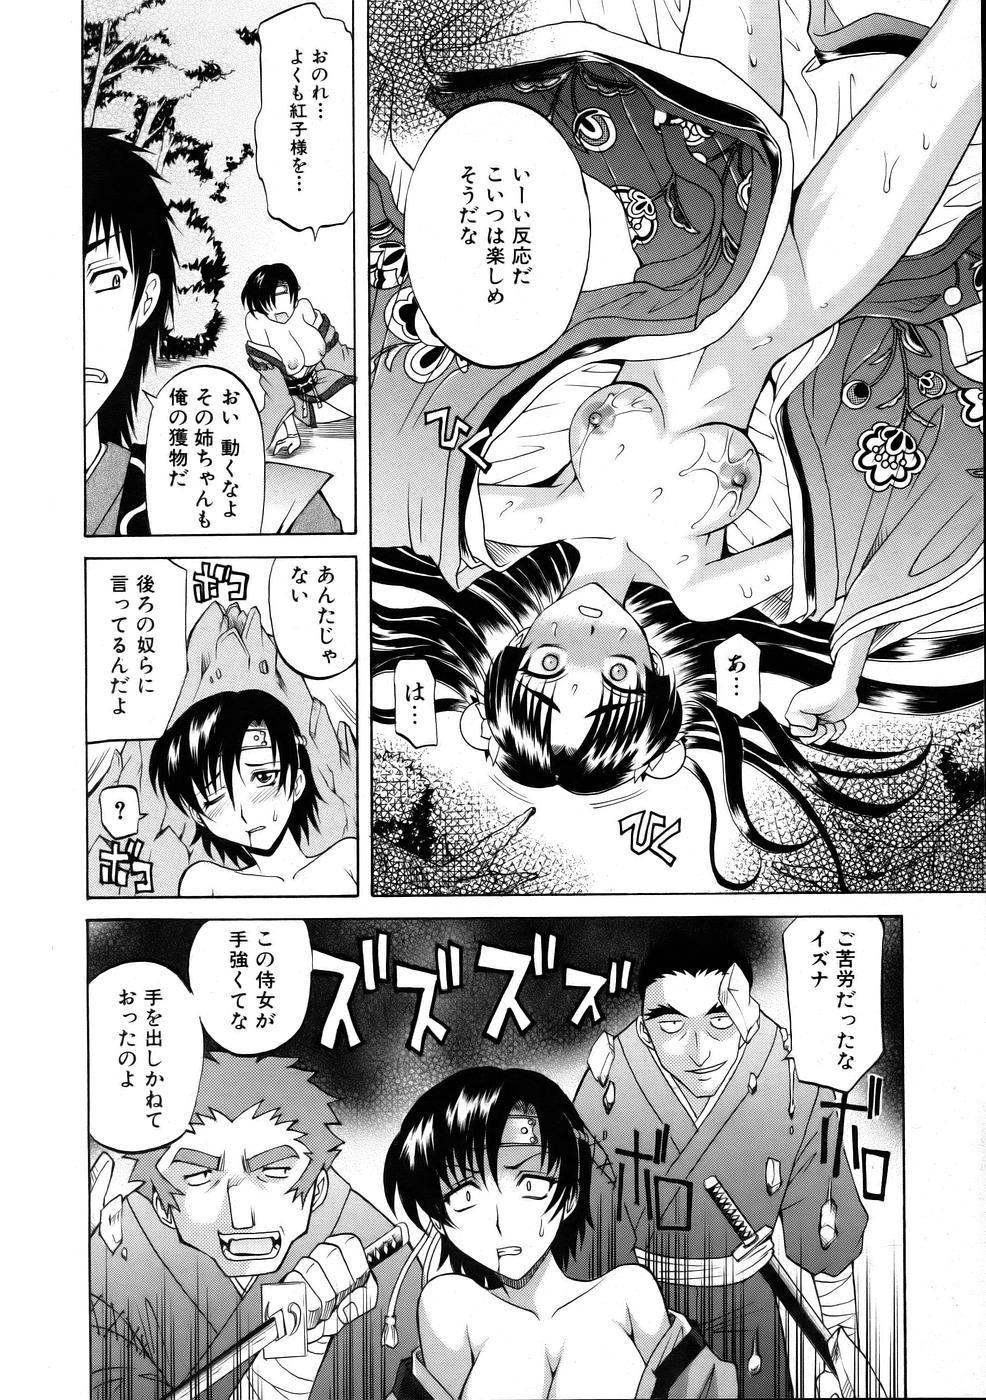 COMIC AUN 2005-10 Vol. 113 59